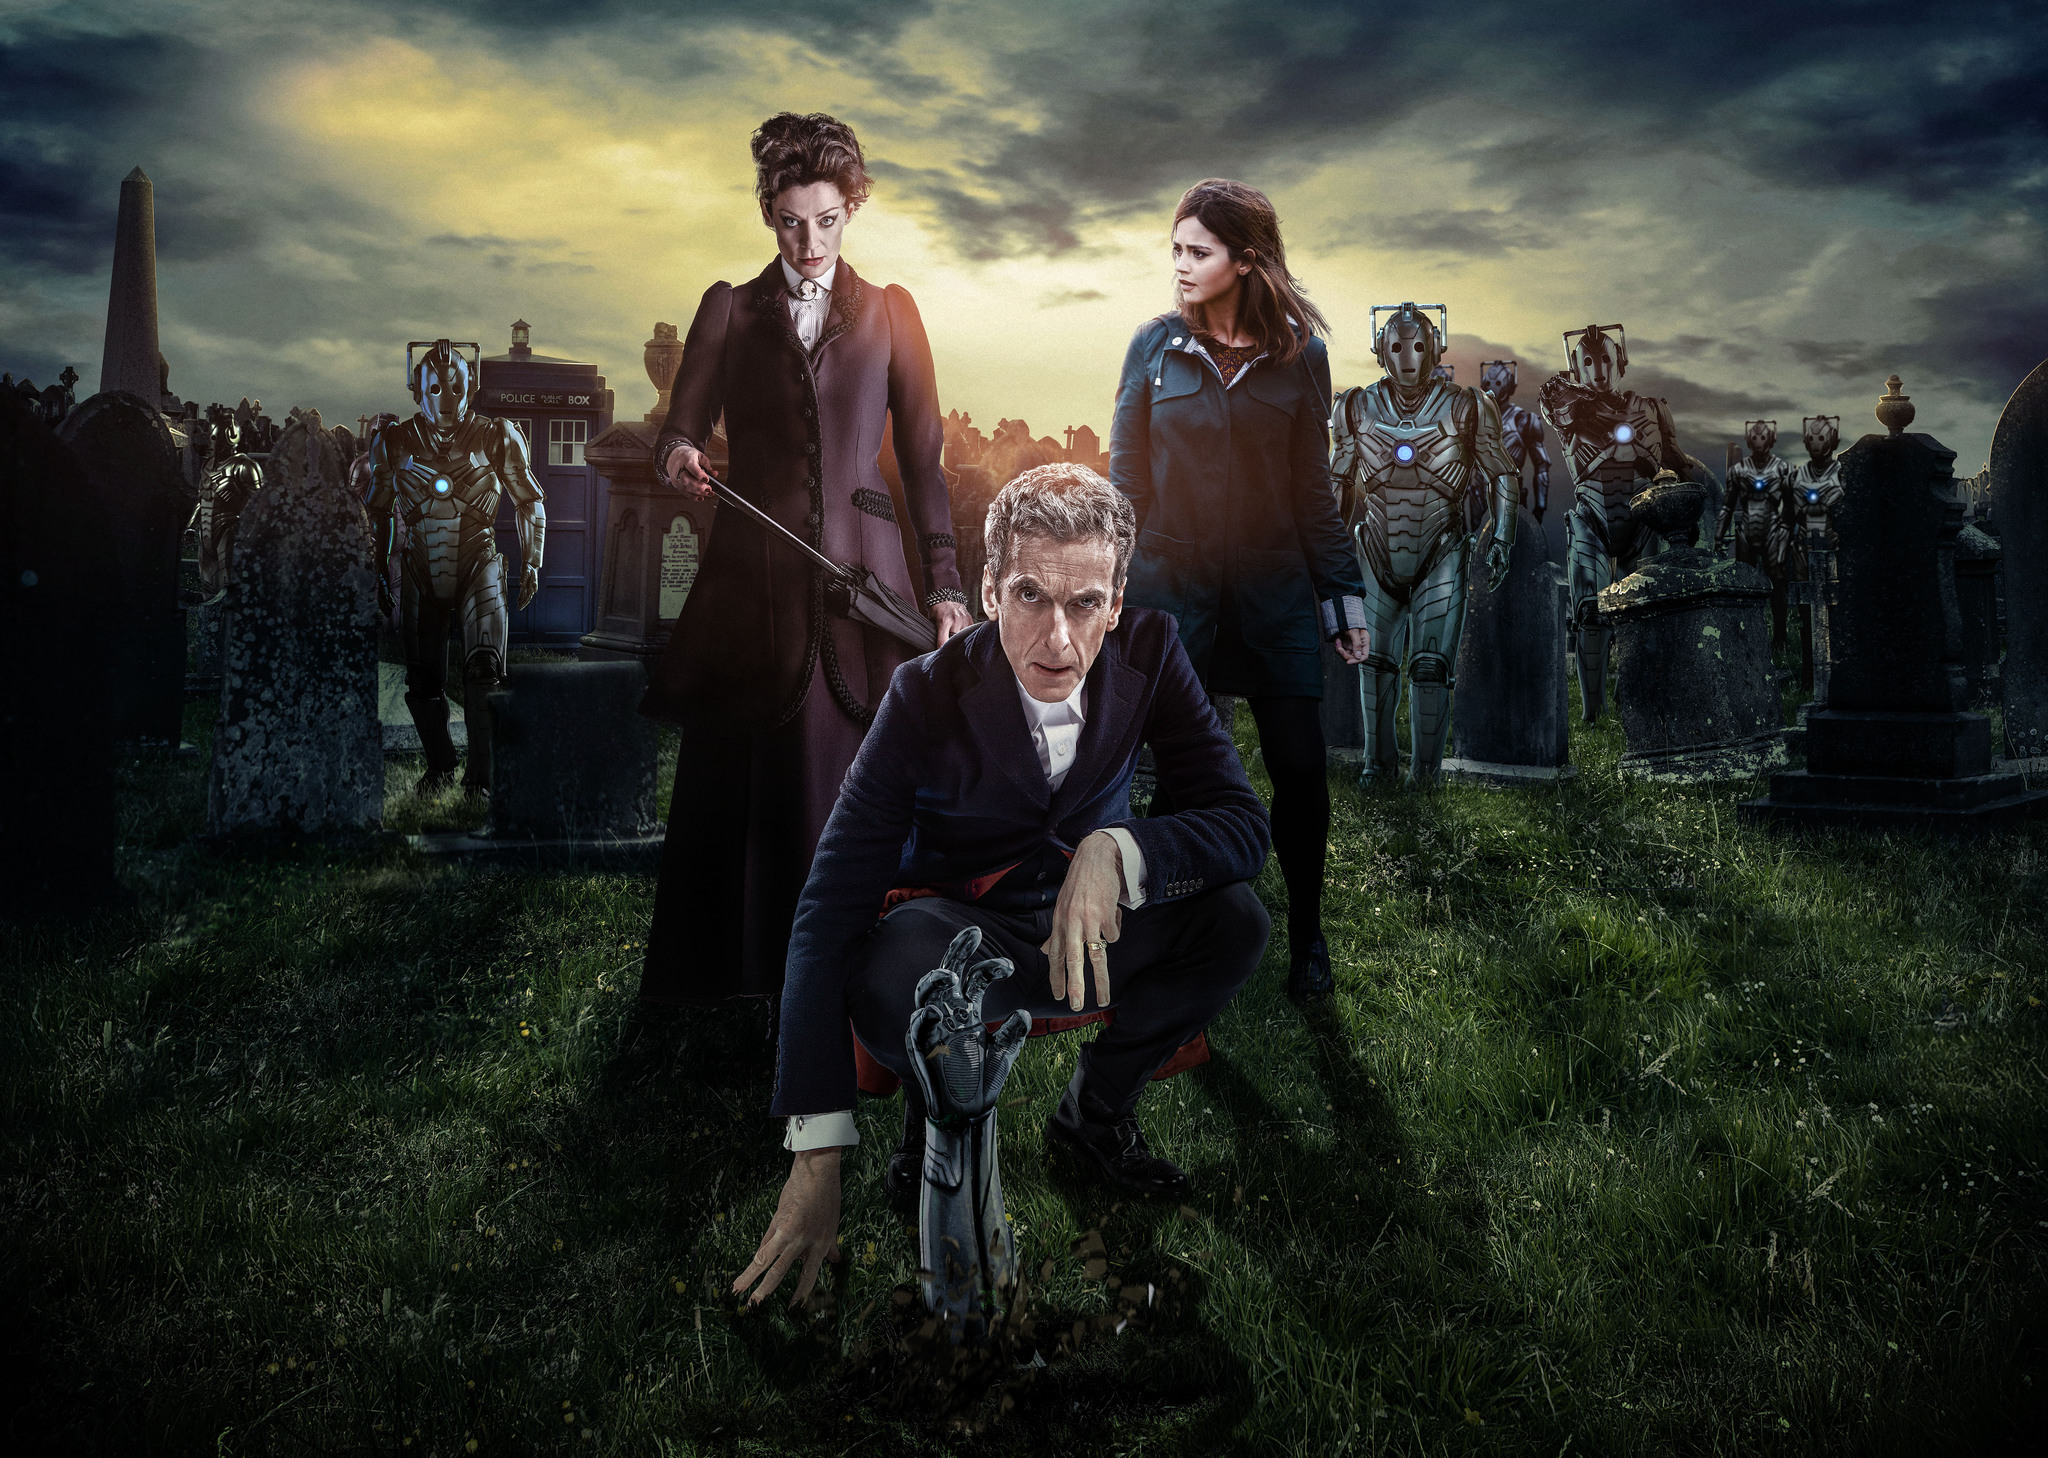 doctor who season 8 torrent 2013